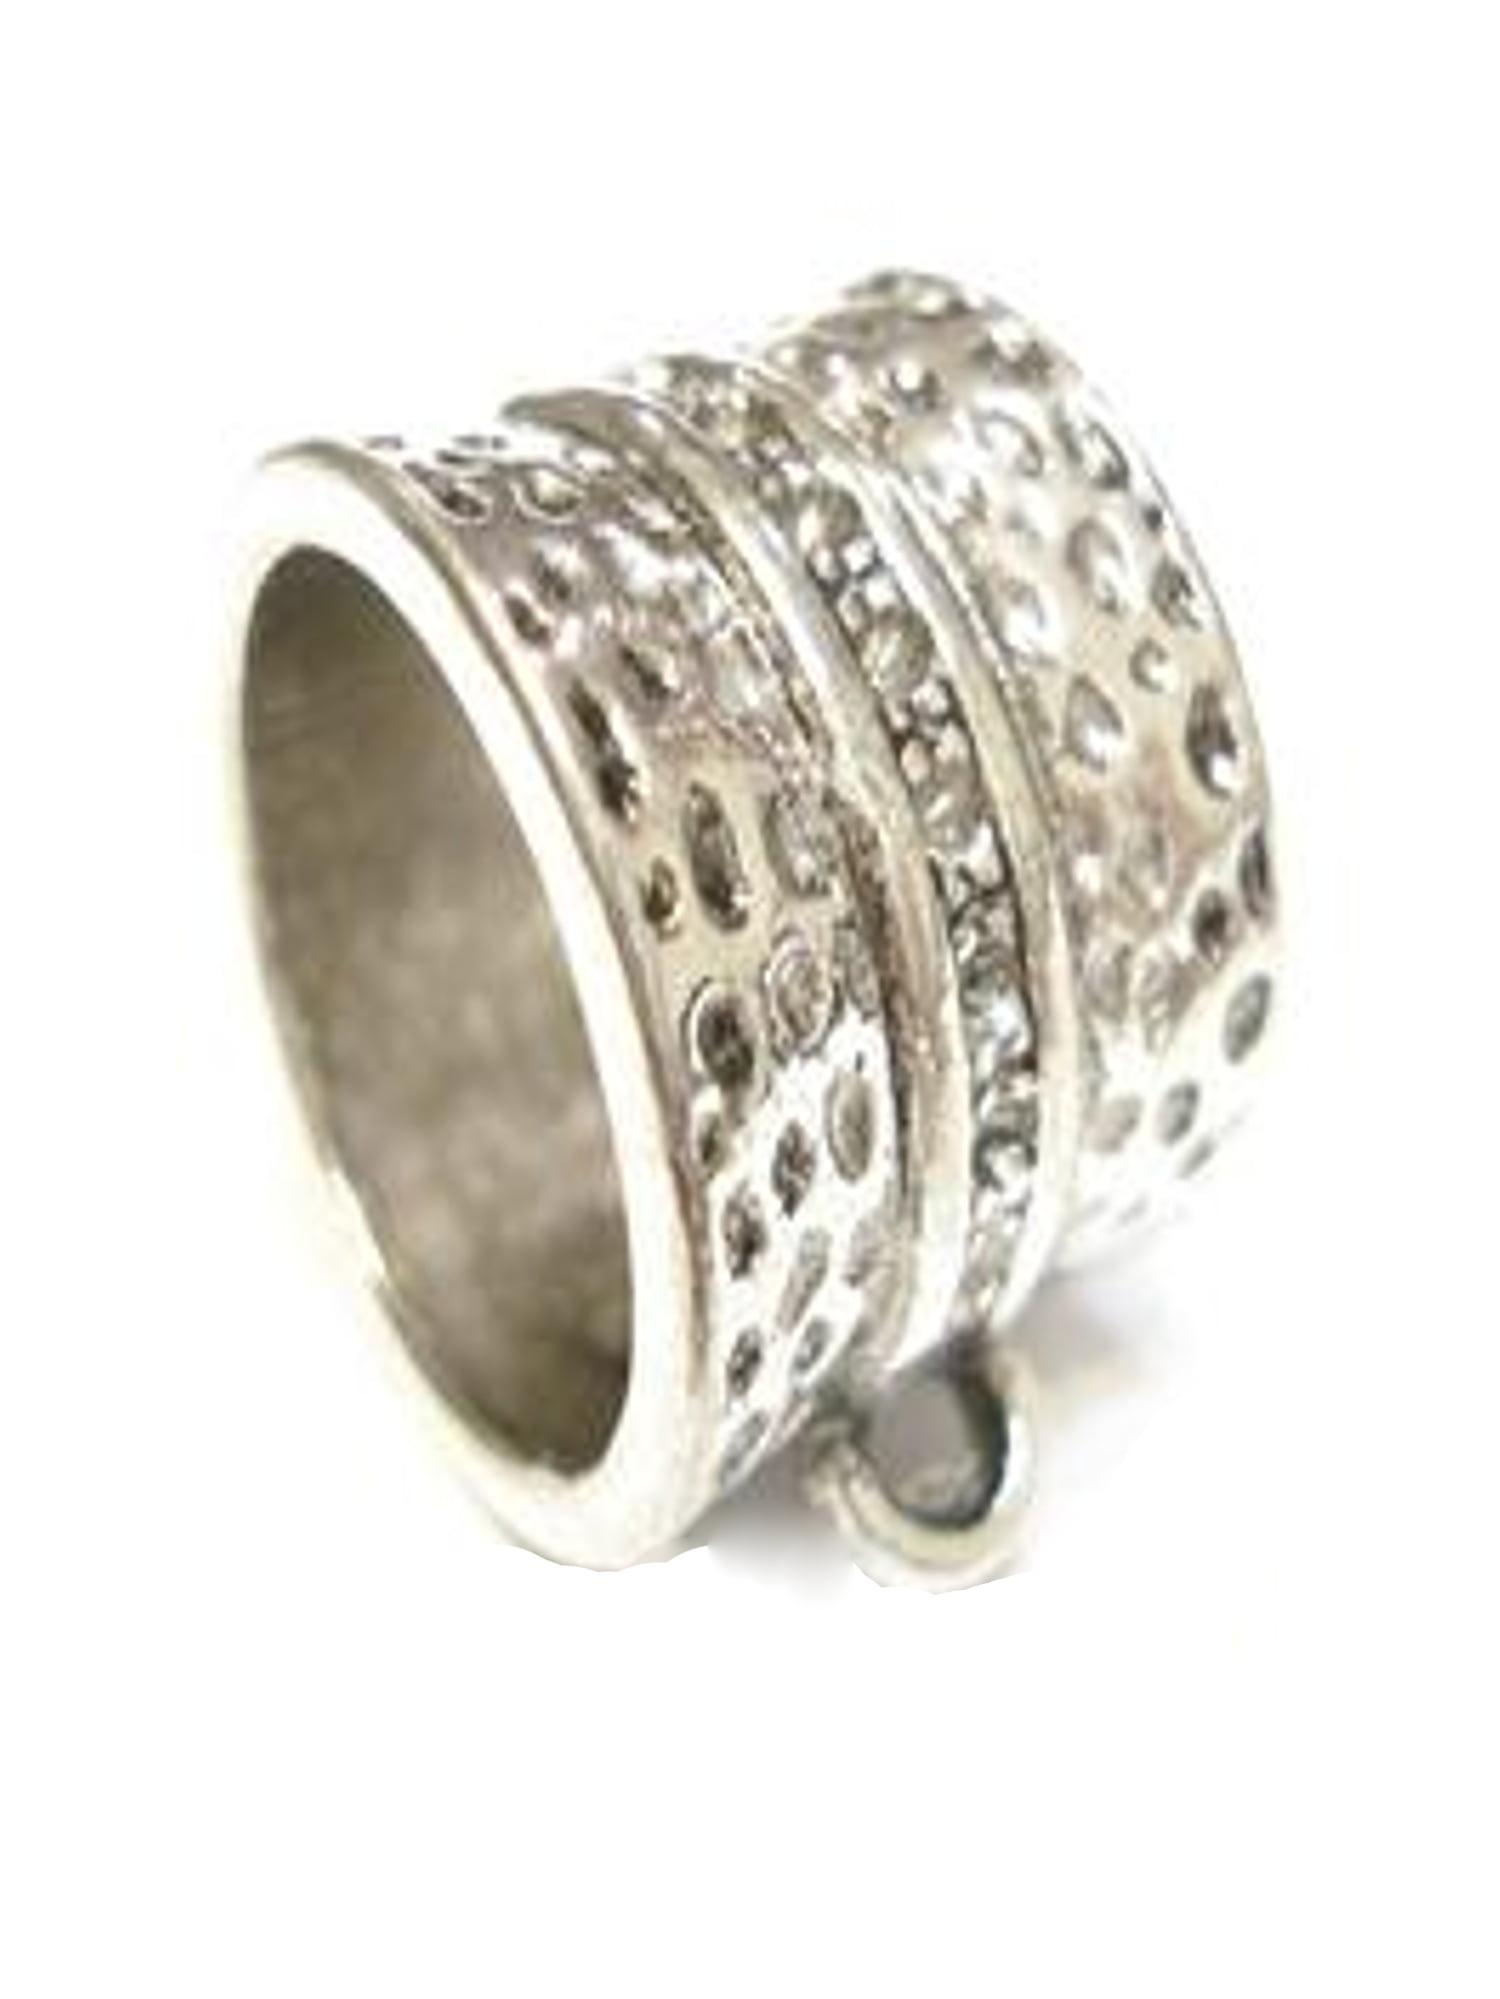 US SELLER-5 scarf pendant bail slide sets DIY jewelry pendant